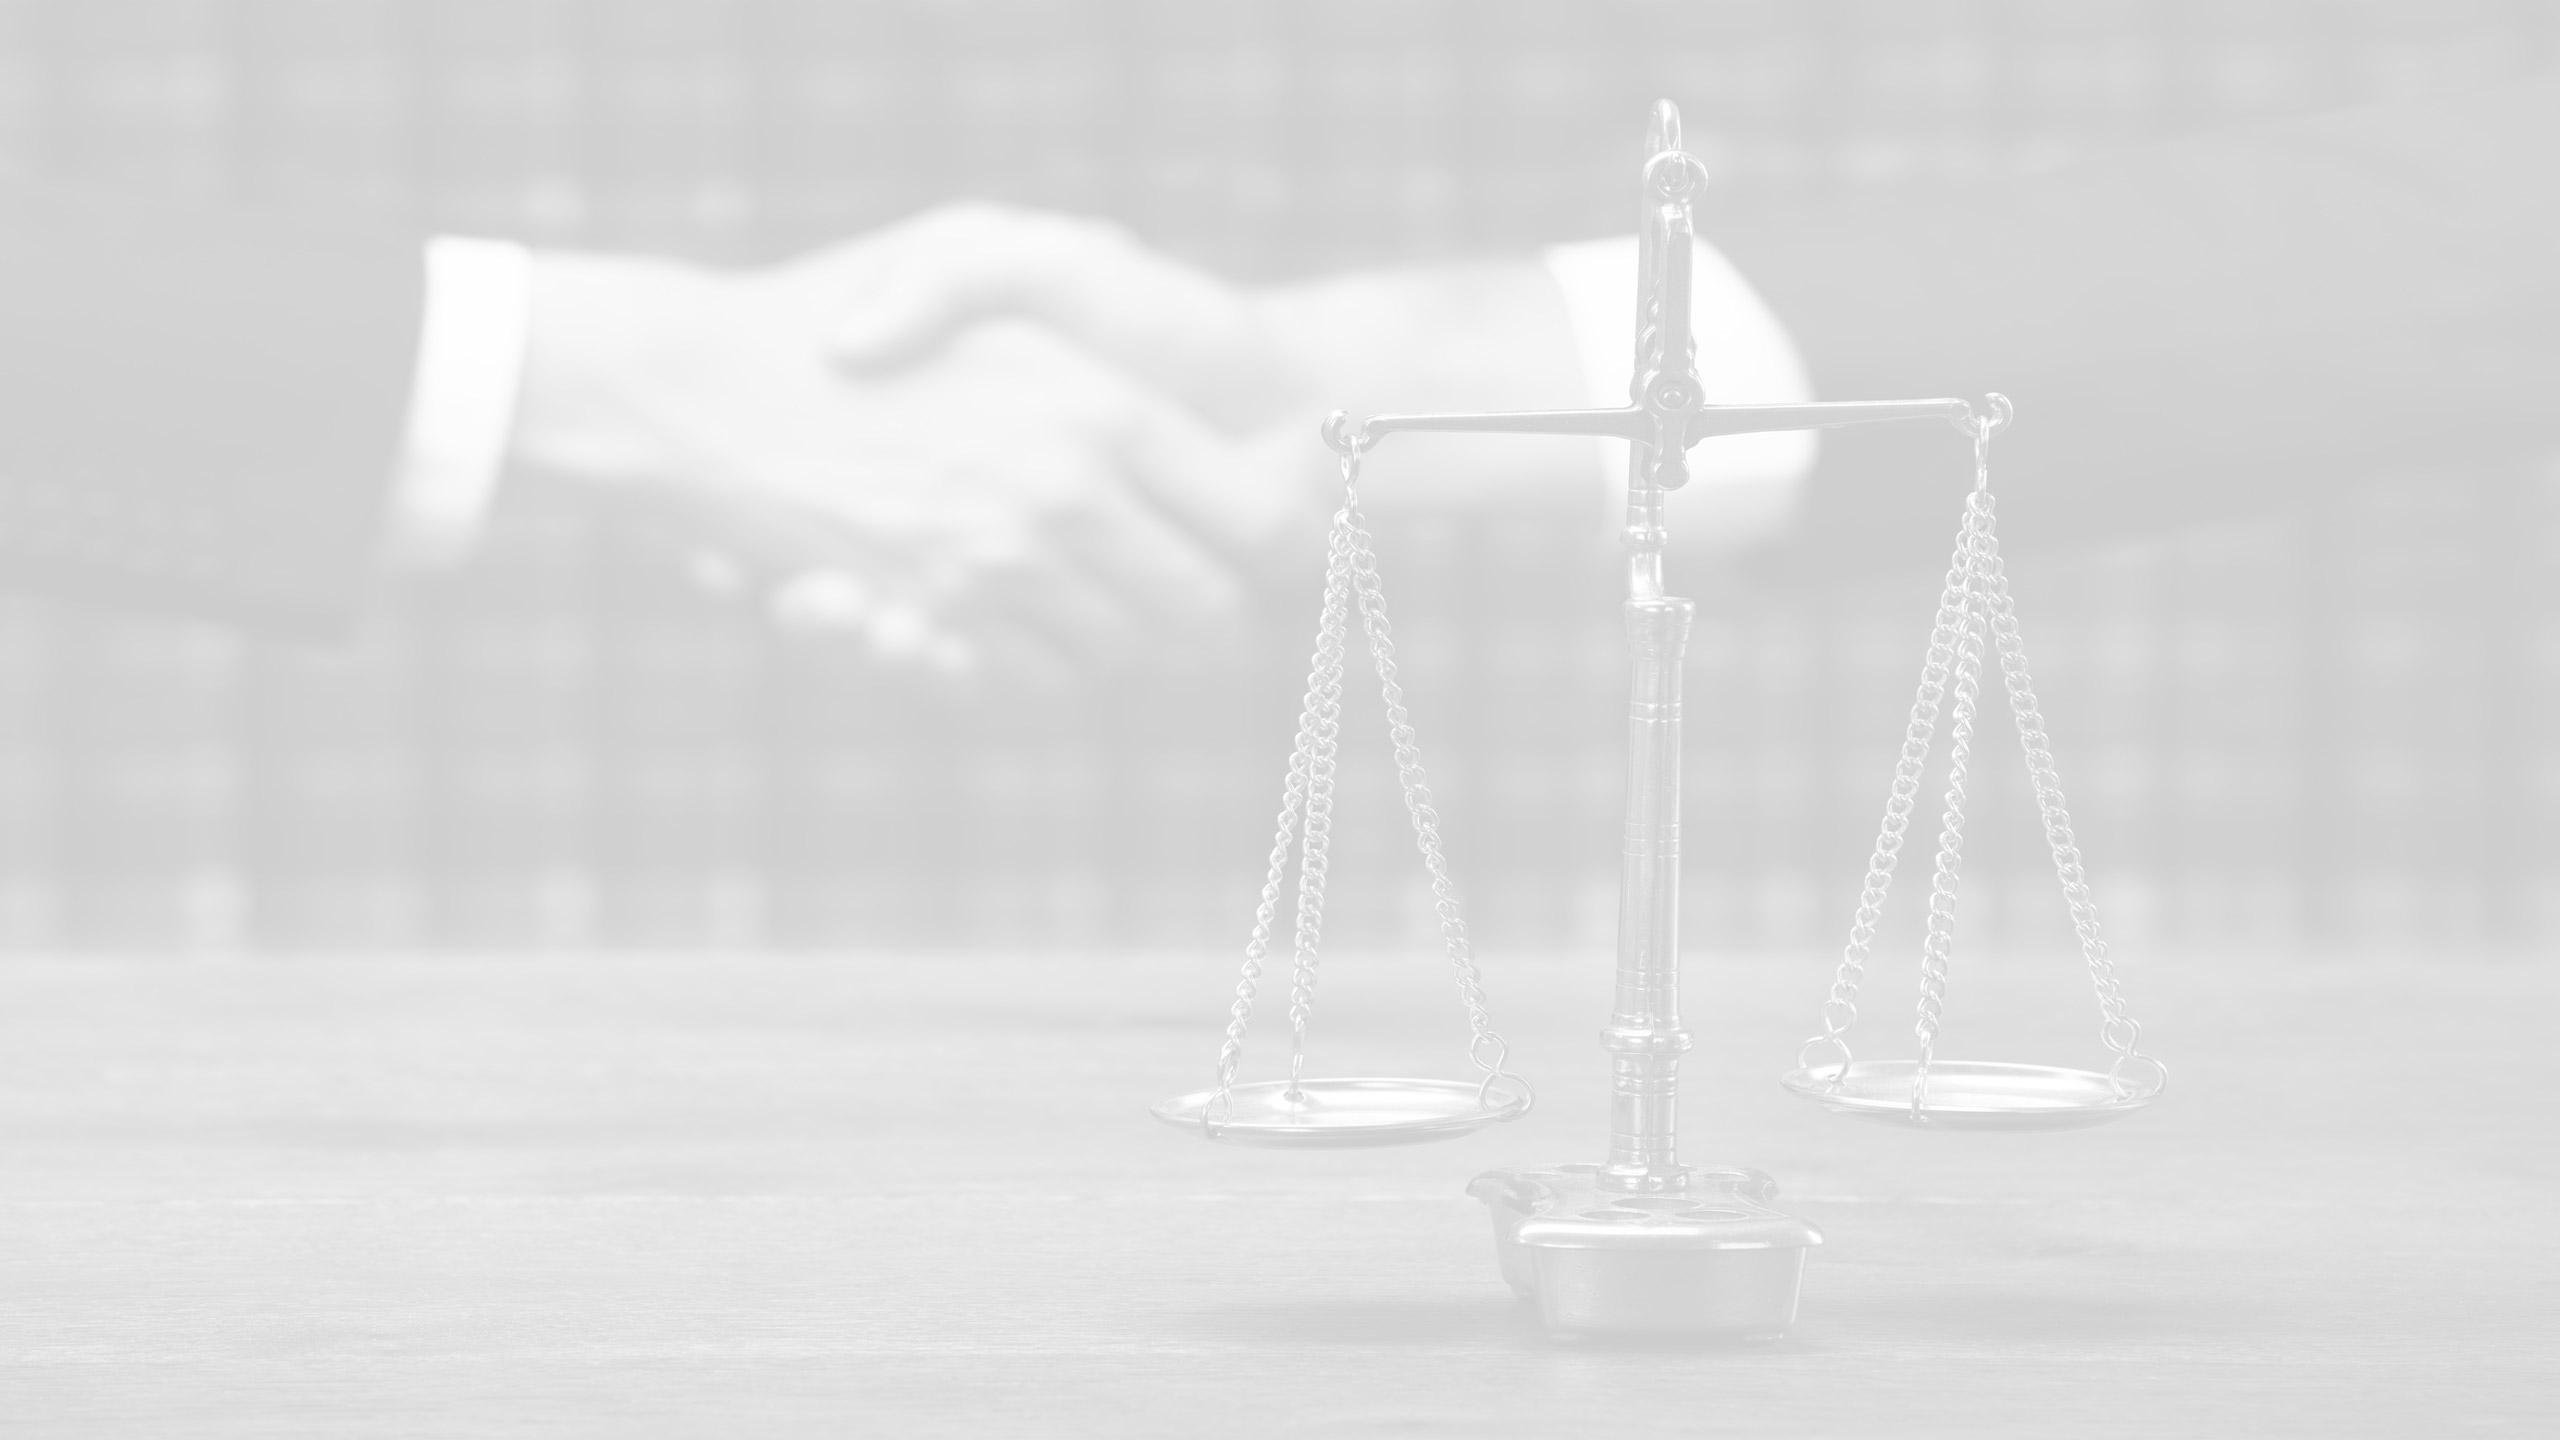 Mediation Conciliation Arbitrage Legrand Lesage Catel Gaultier